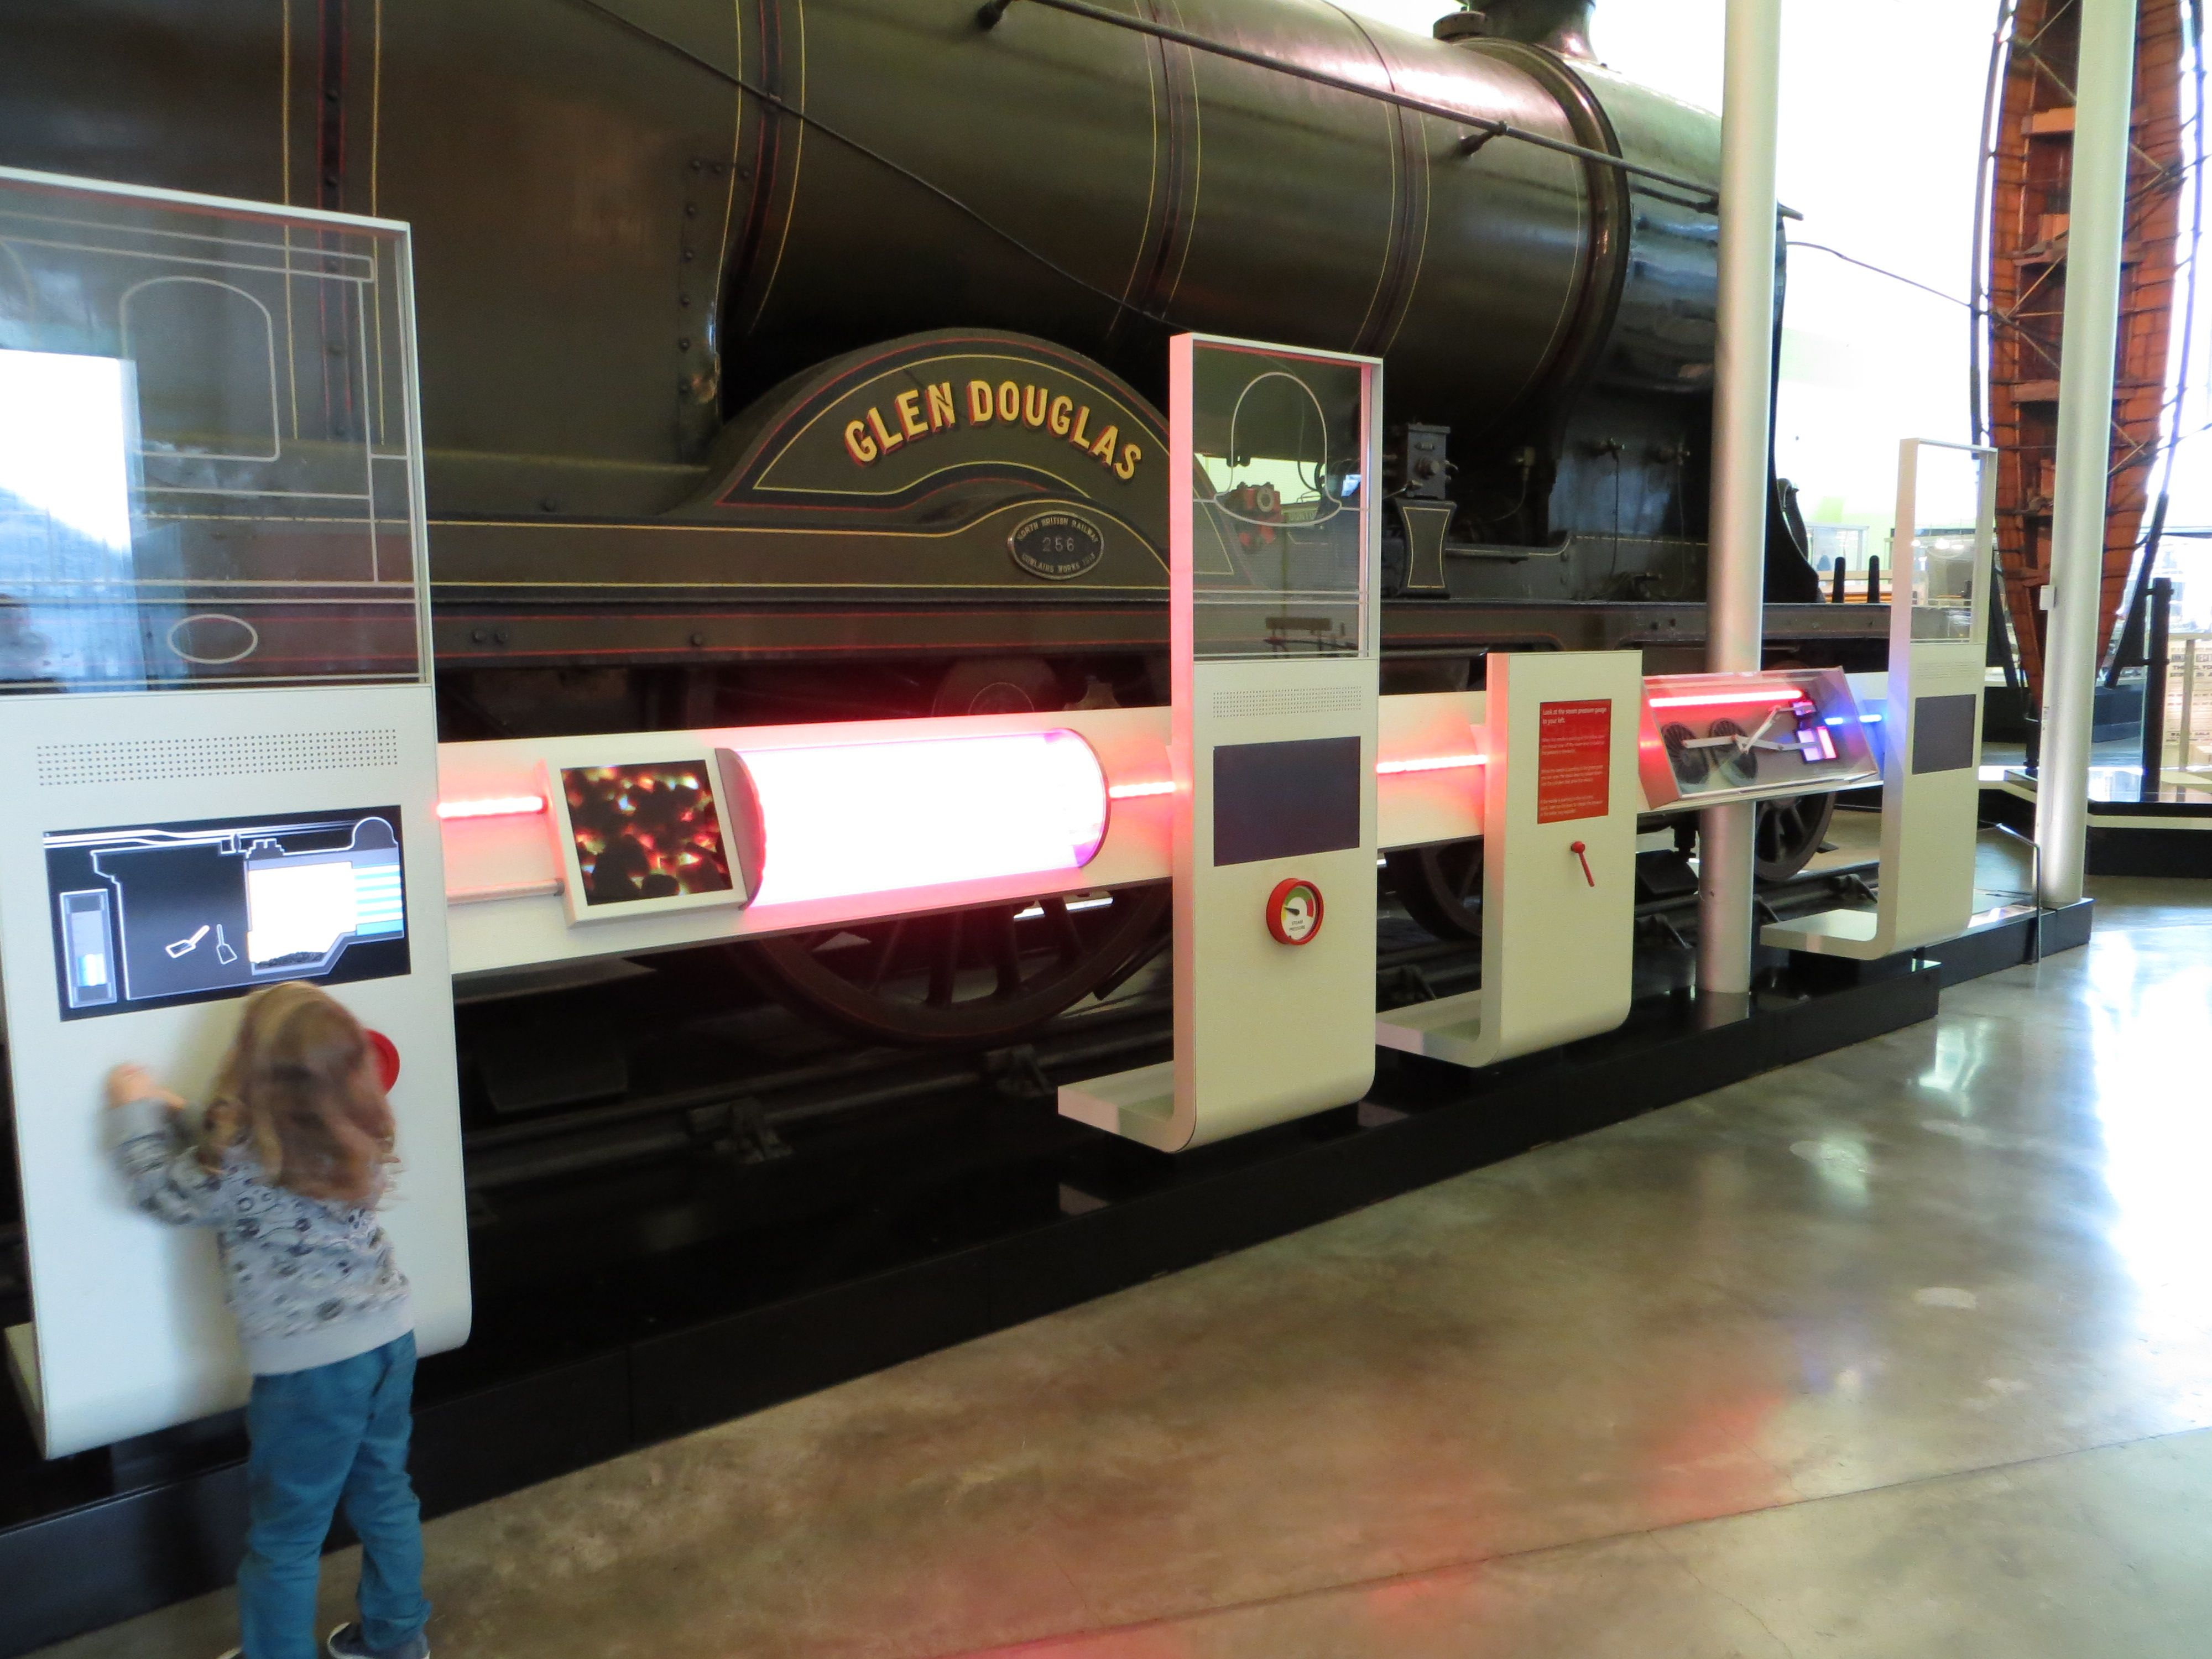 Glen Douglas locomotive hybrid interactive exhibit